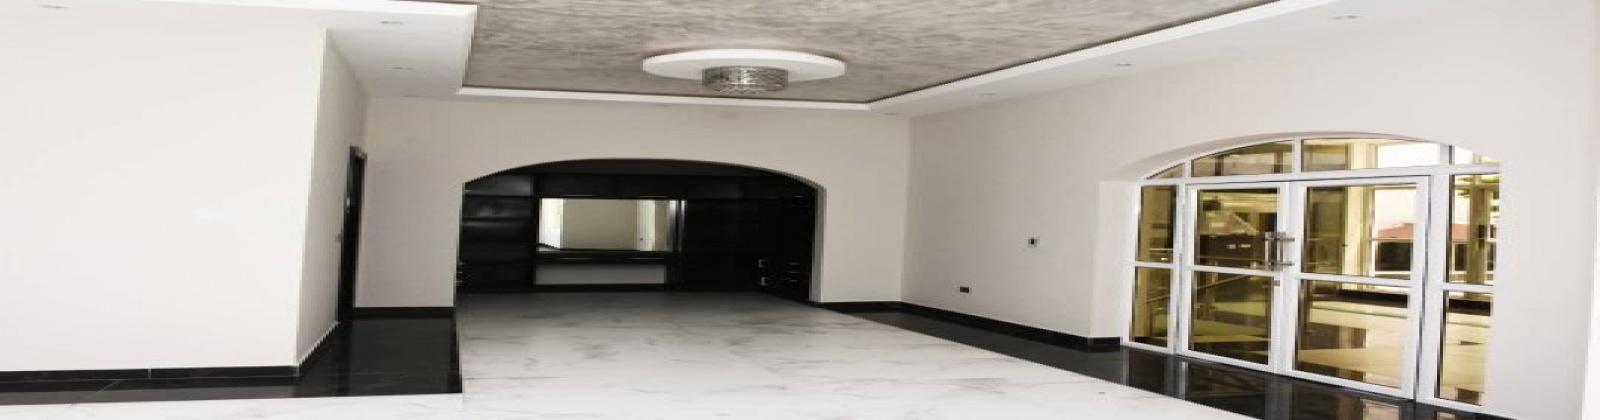 asokoro, Abuja, Abuja, 5 Bedrooms Bedrooms, 1 Room Rooms,5 BathroomsBathrooms,Apartment,For Sale,asokoro,1006